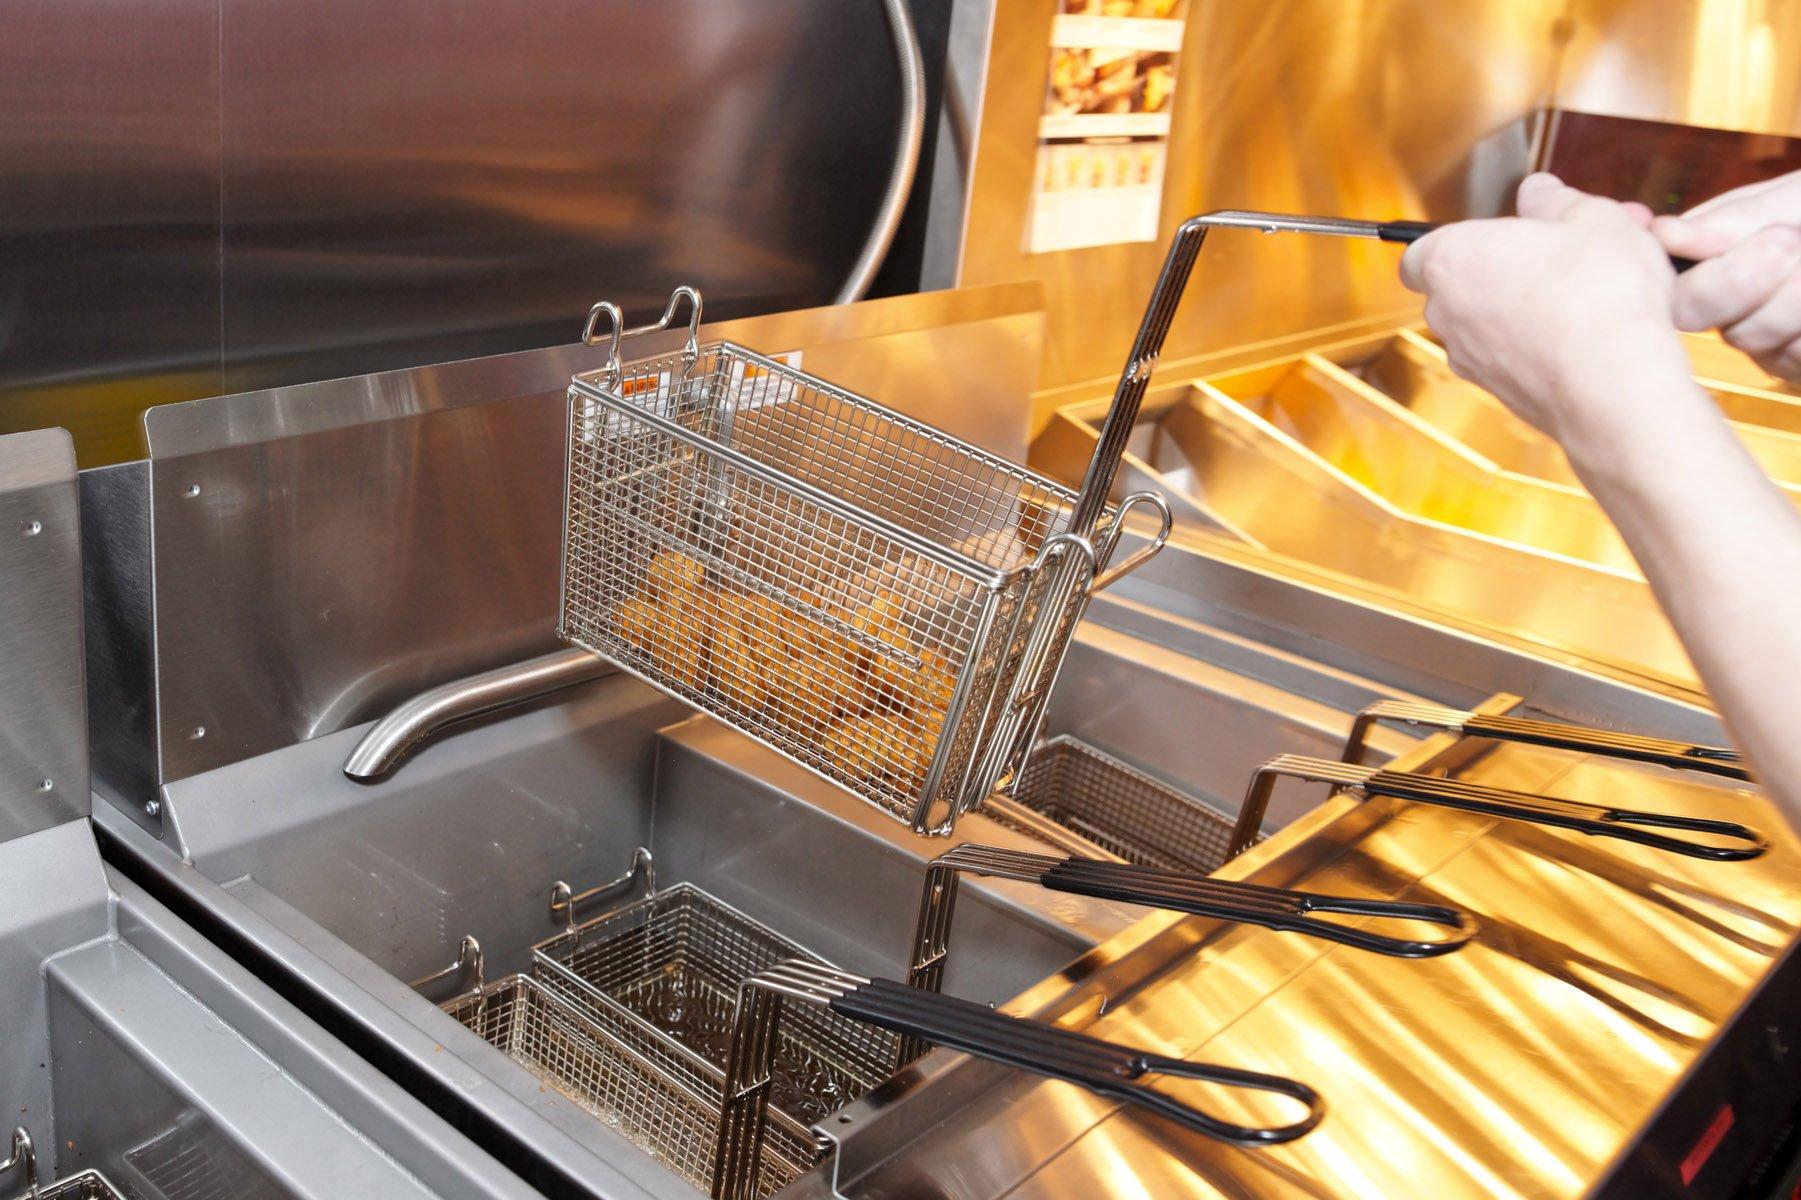 OwlOps - Fryer Maintenance